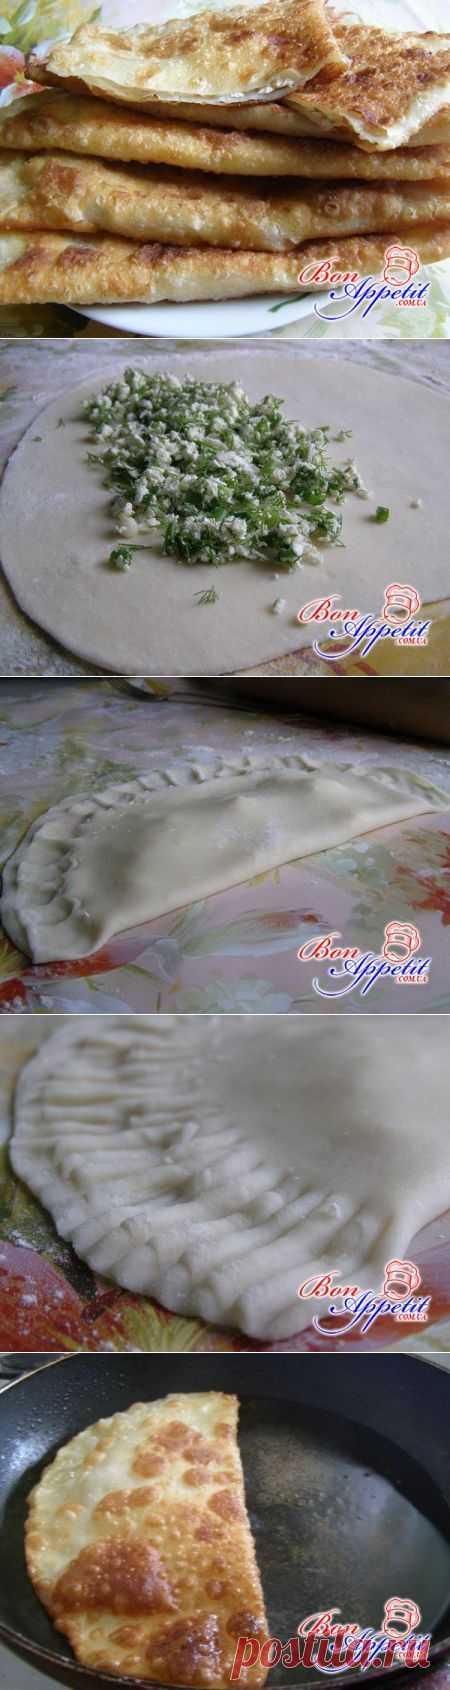 matchless RUGUVAChKI - just super, dough remarkable thin, a stuffing tasty.